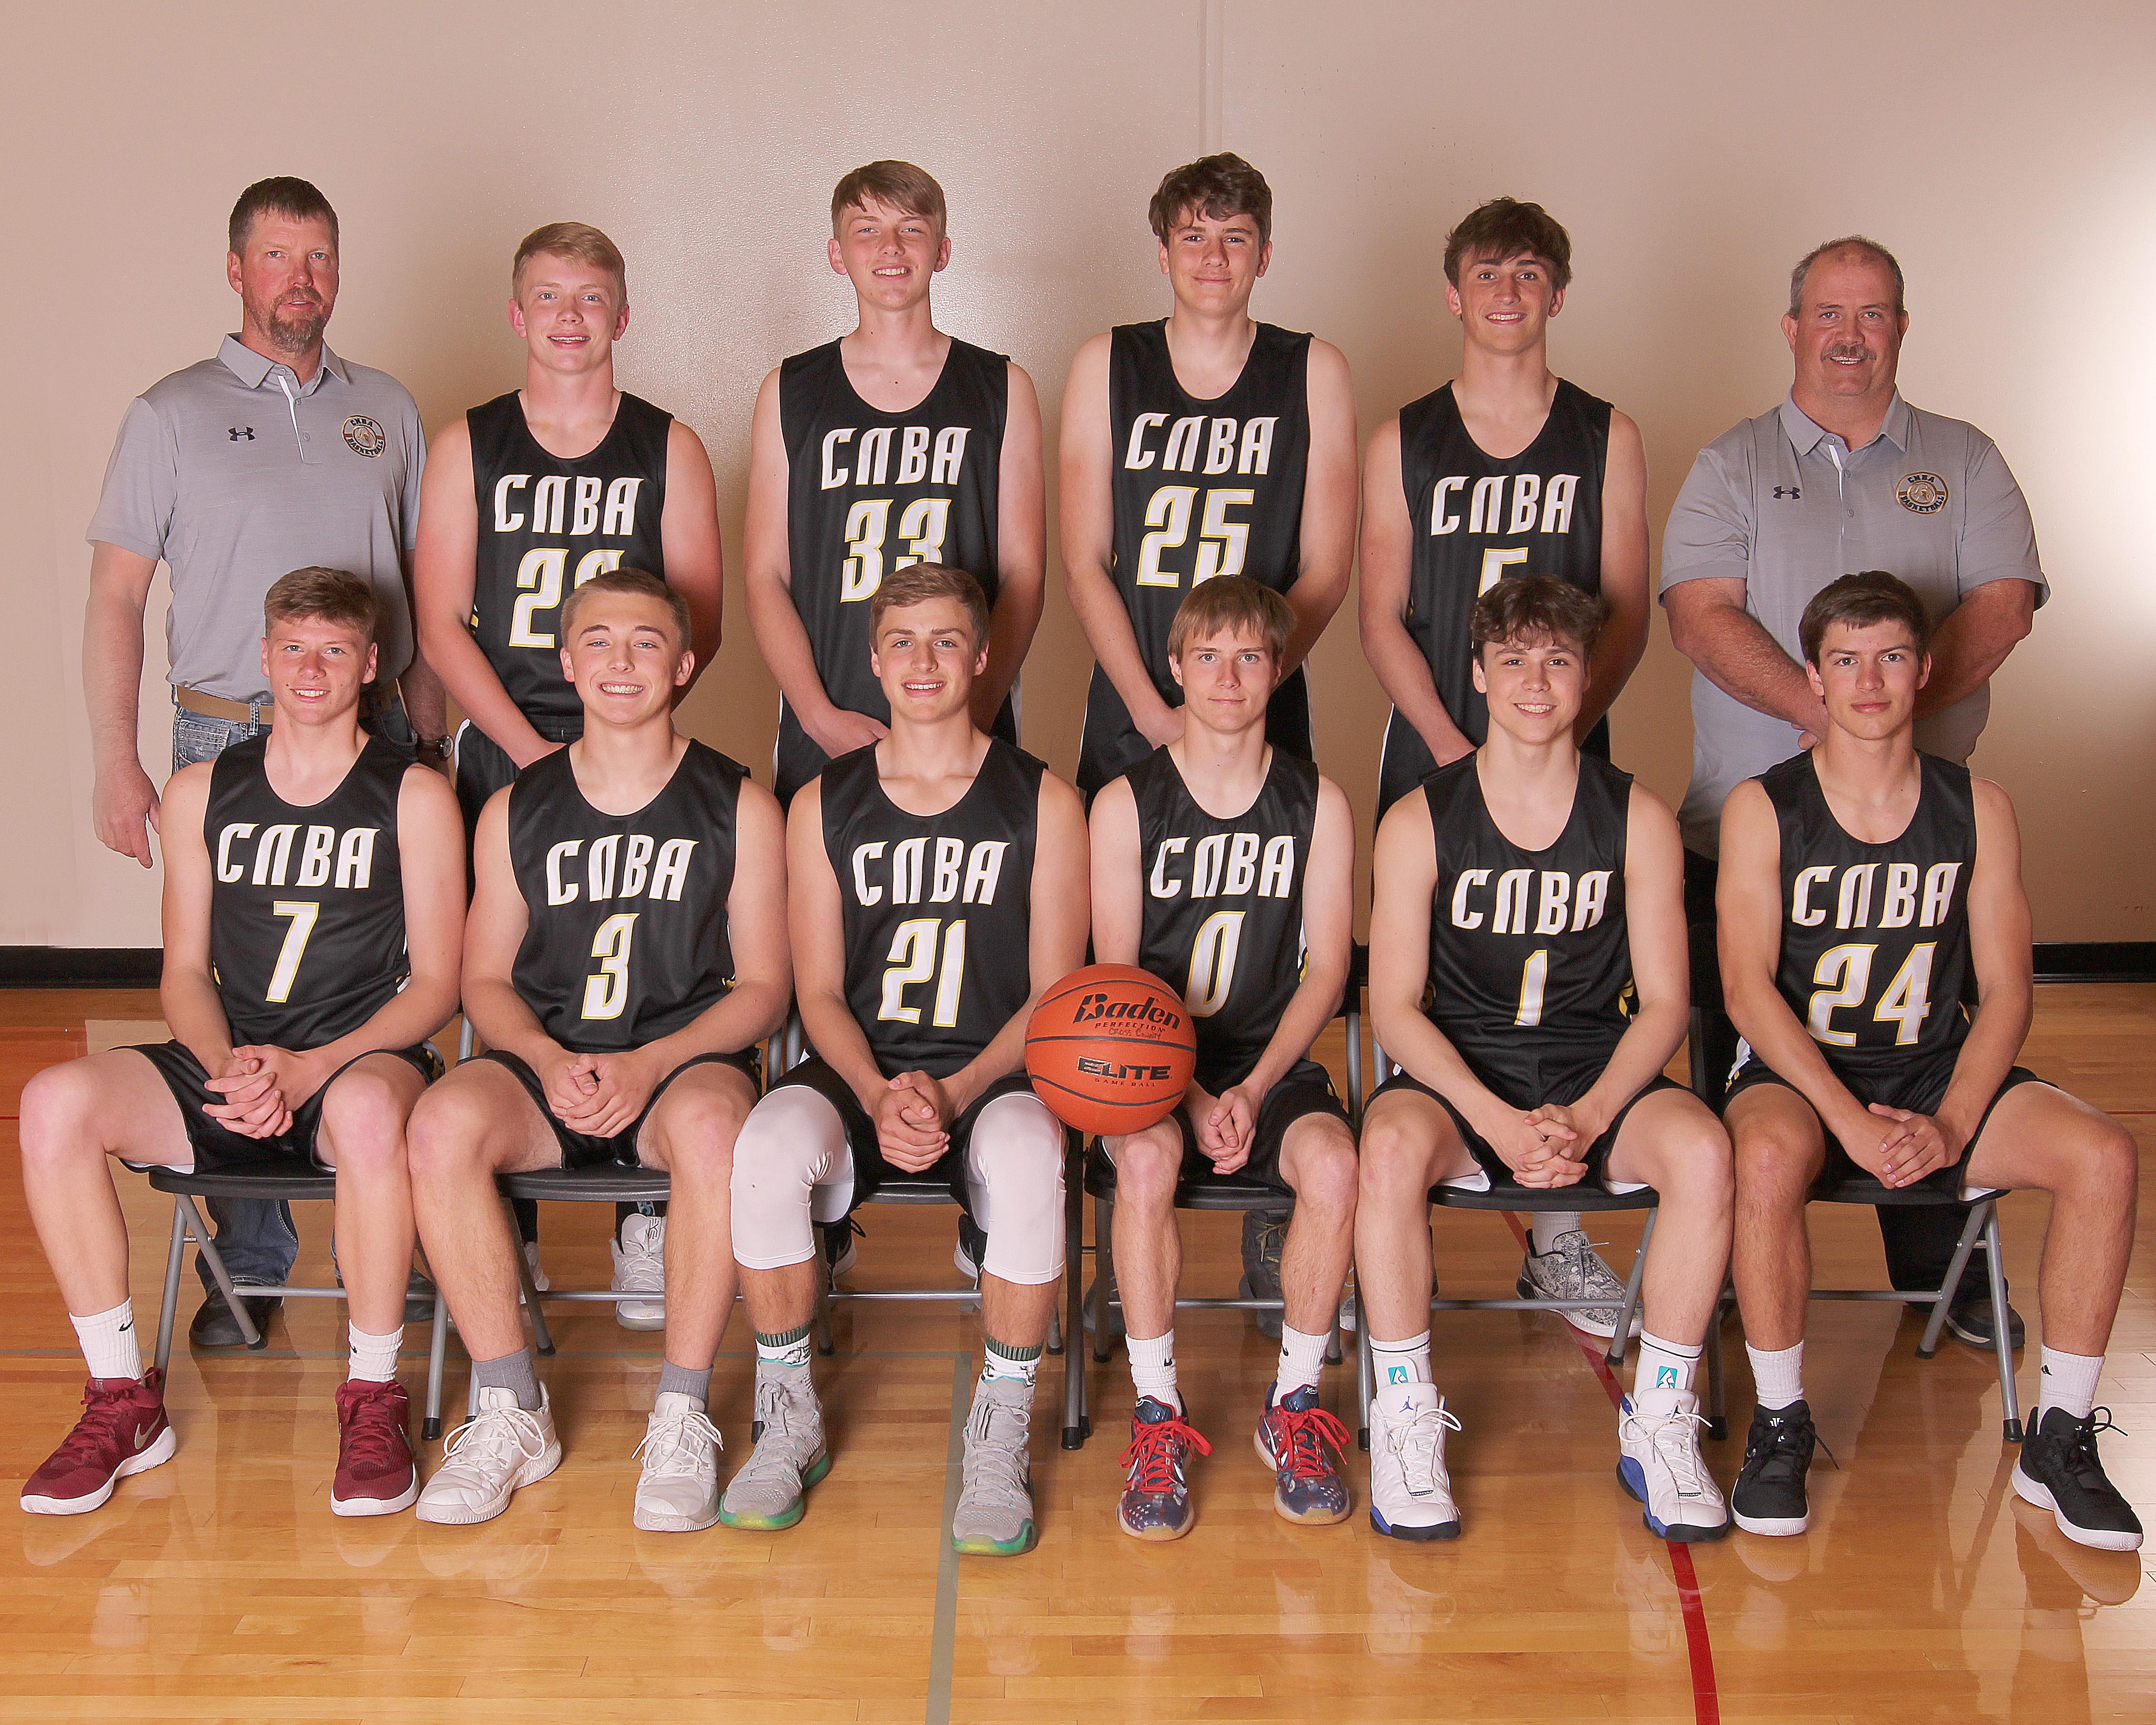 cnba92 (10 boys main)